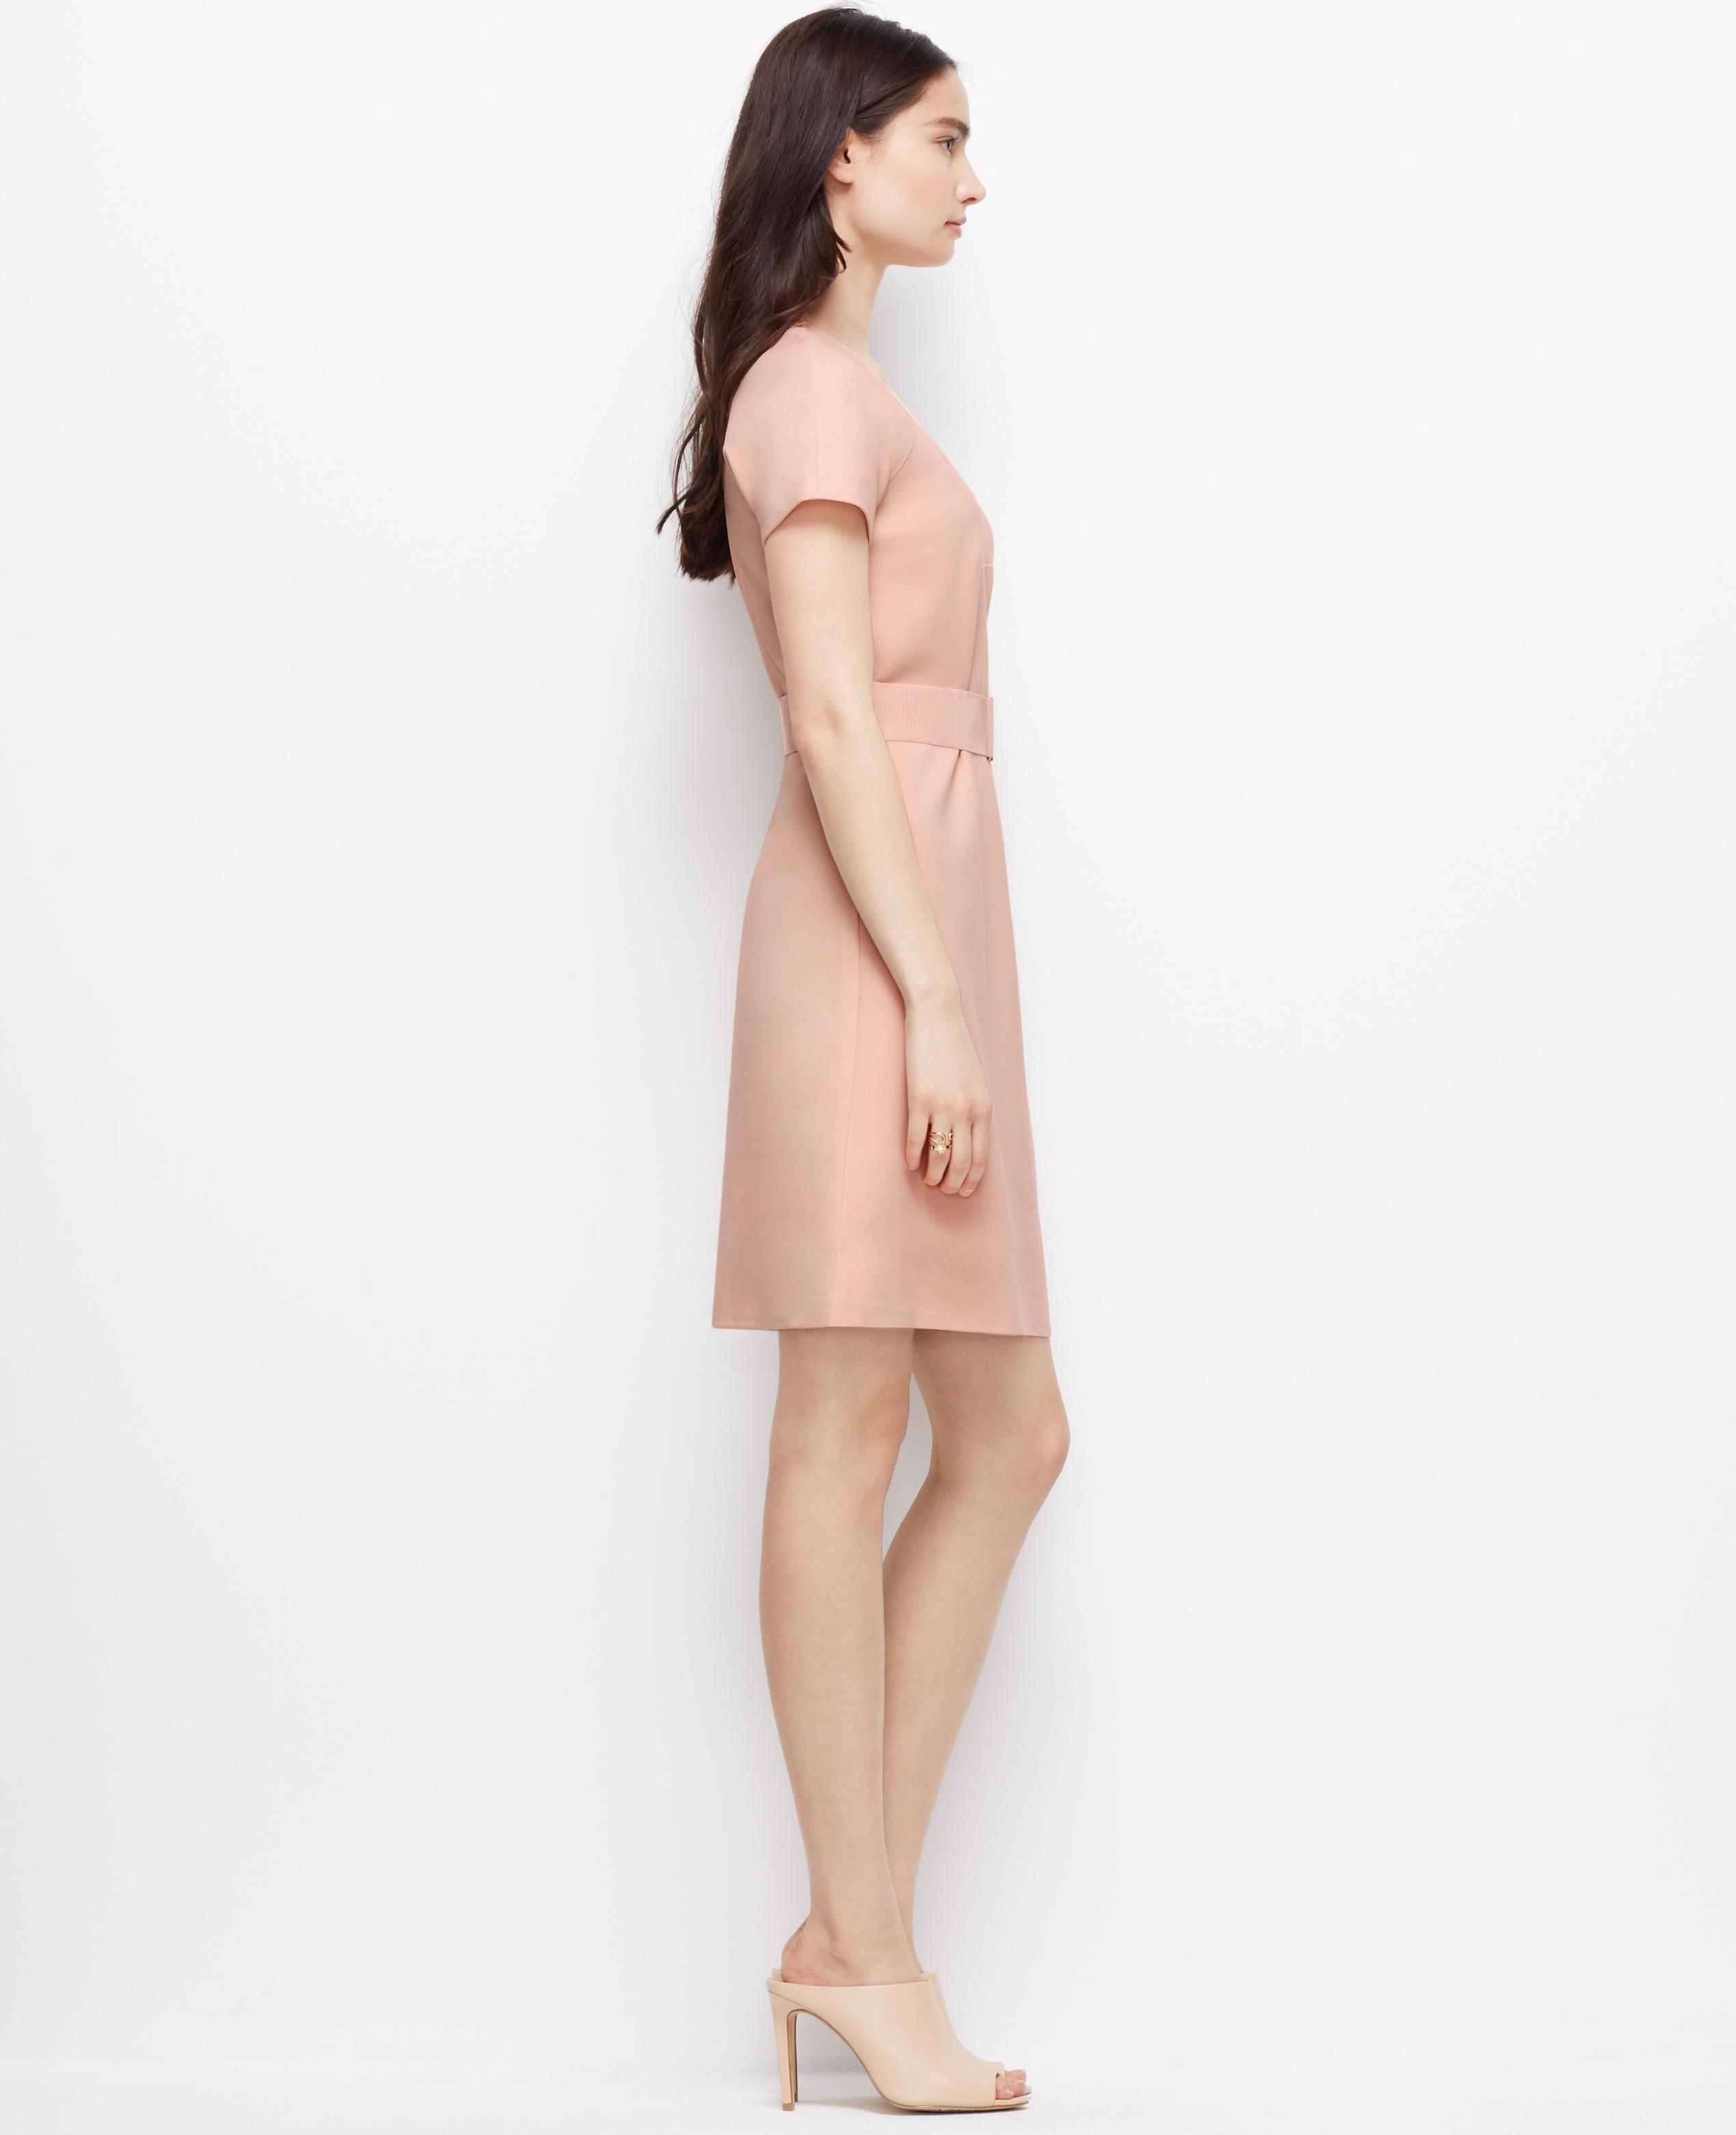 ann taylor formal dresses gallery - dresses design ideas